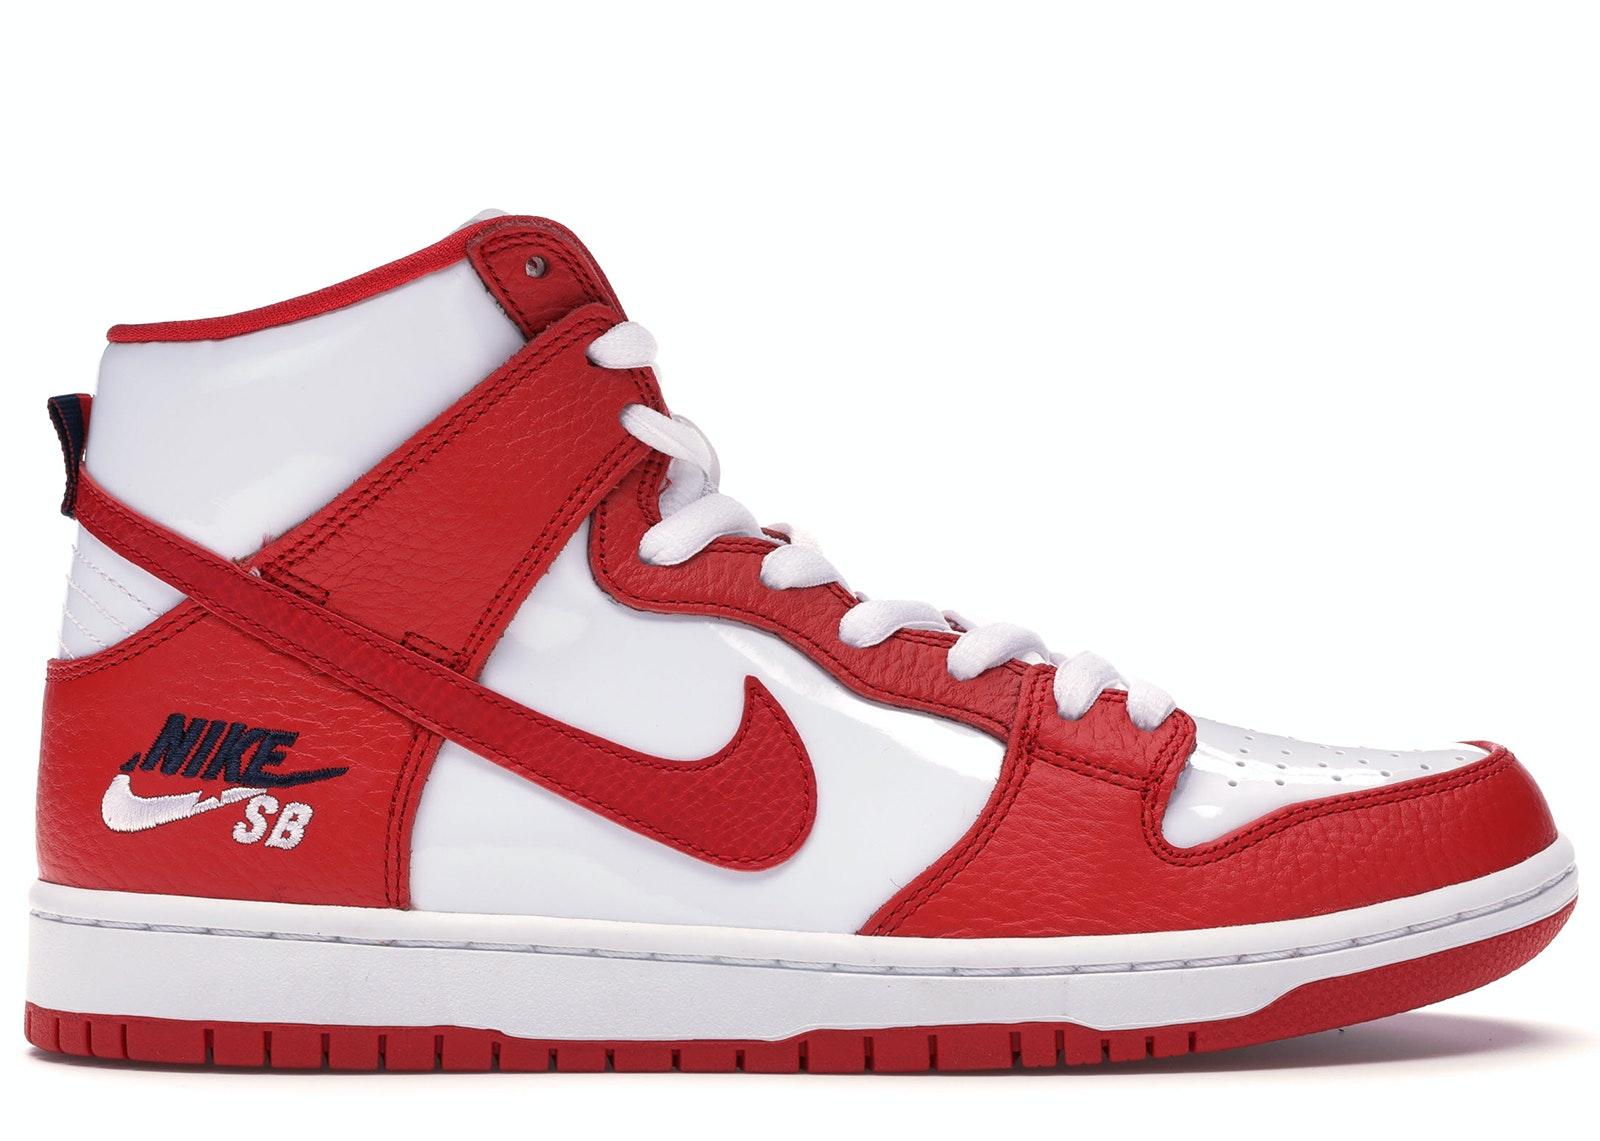 Nike SB Dunk High Future Court Red